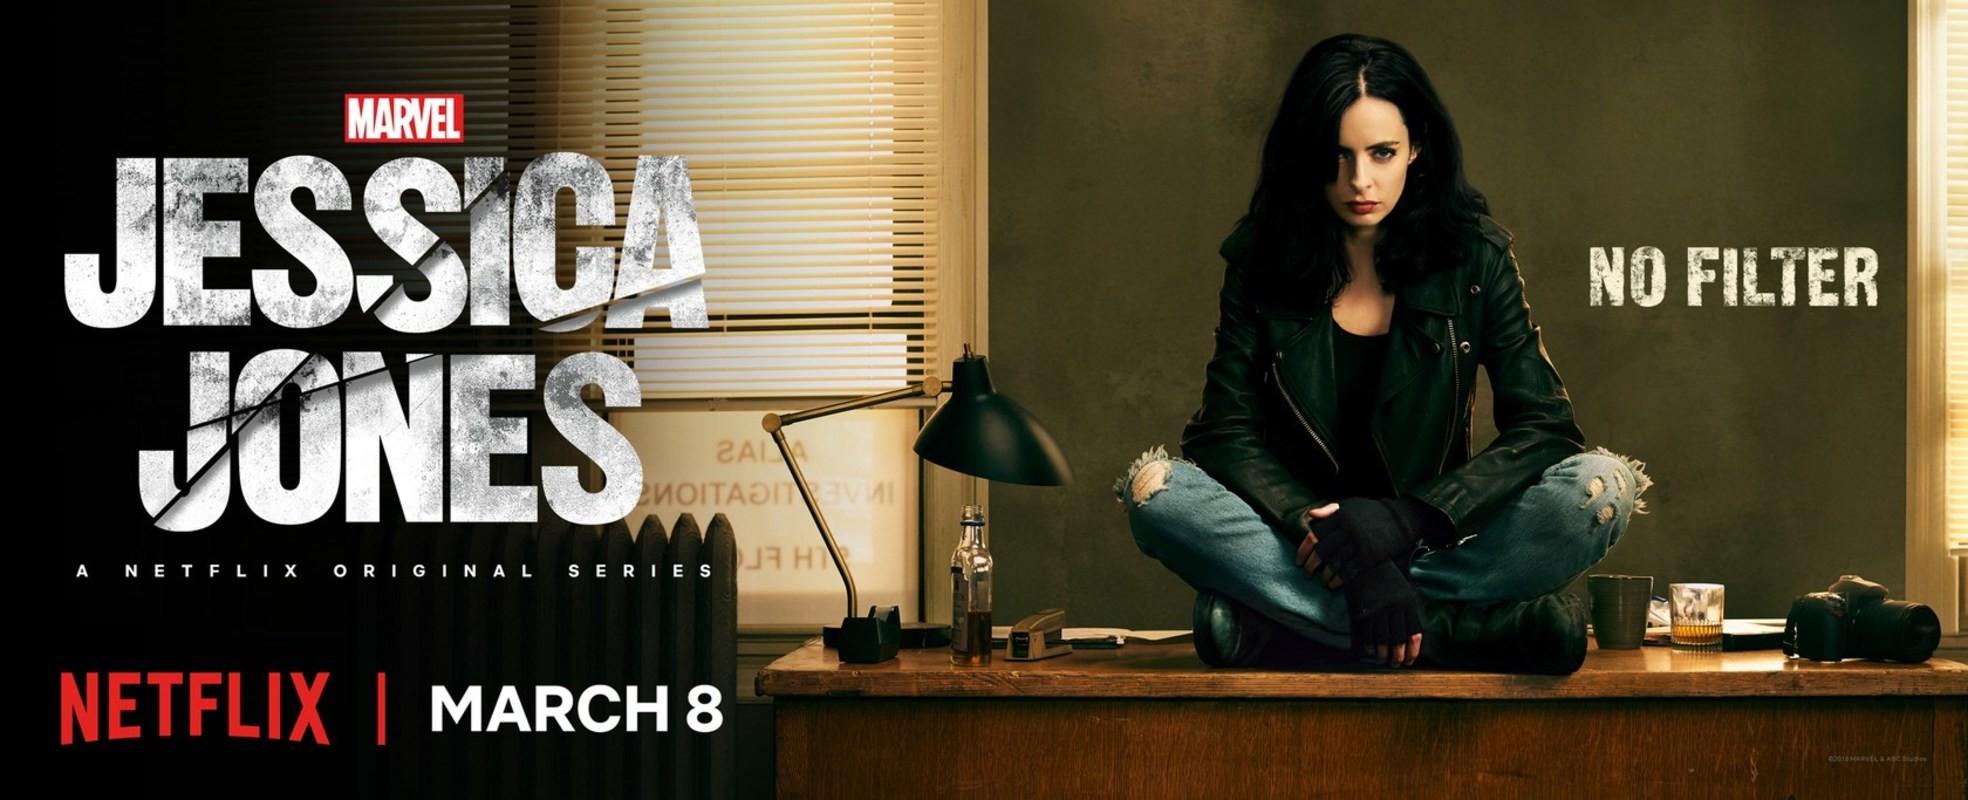 Jessica Jones for Netflix